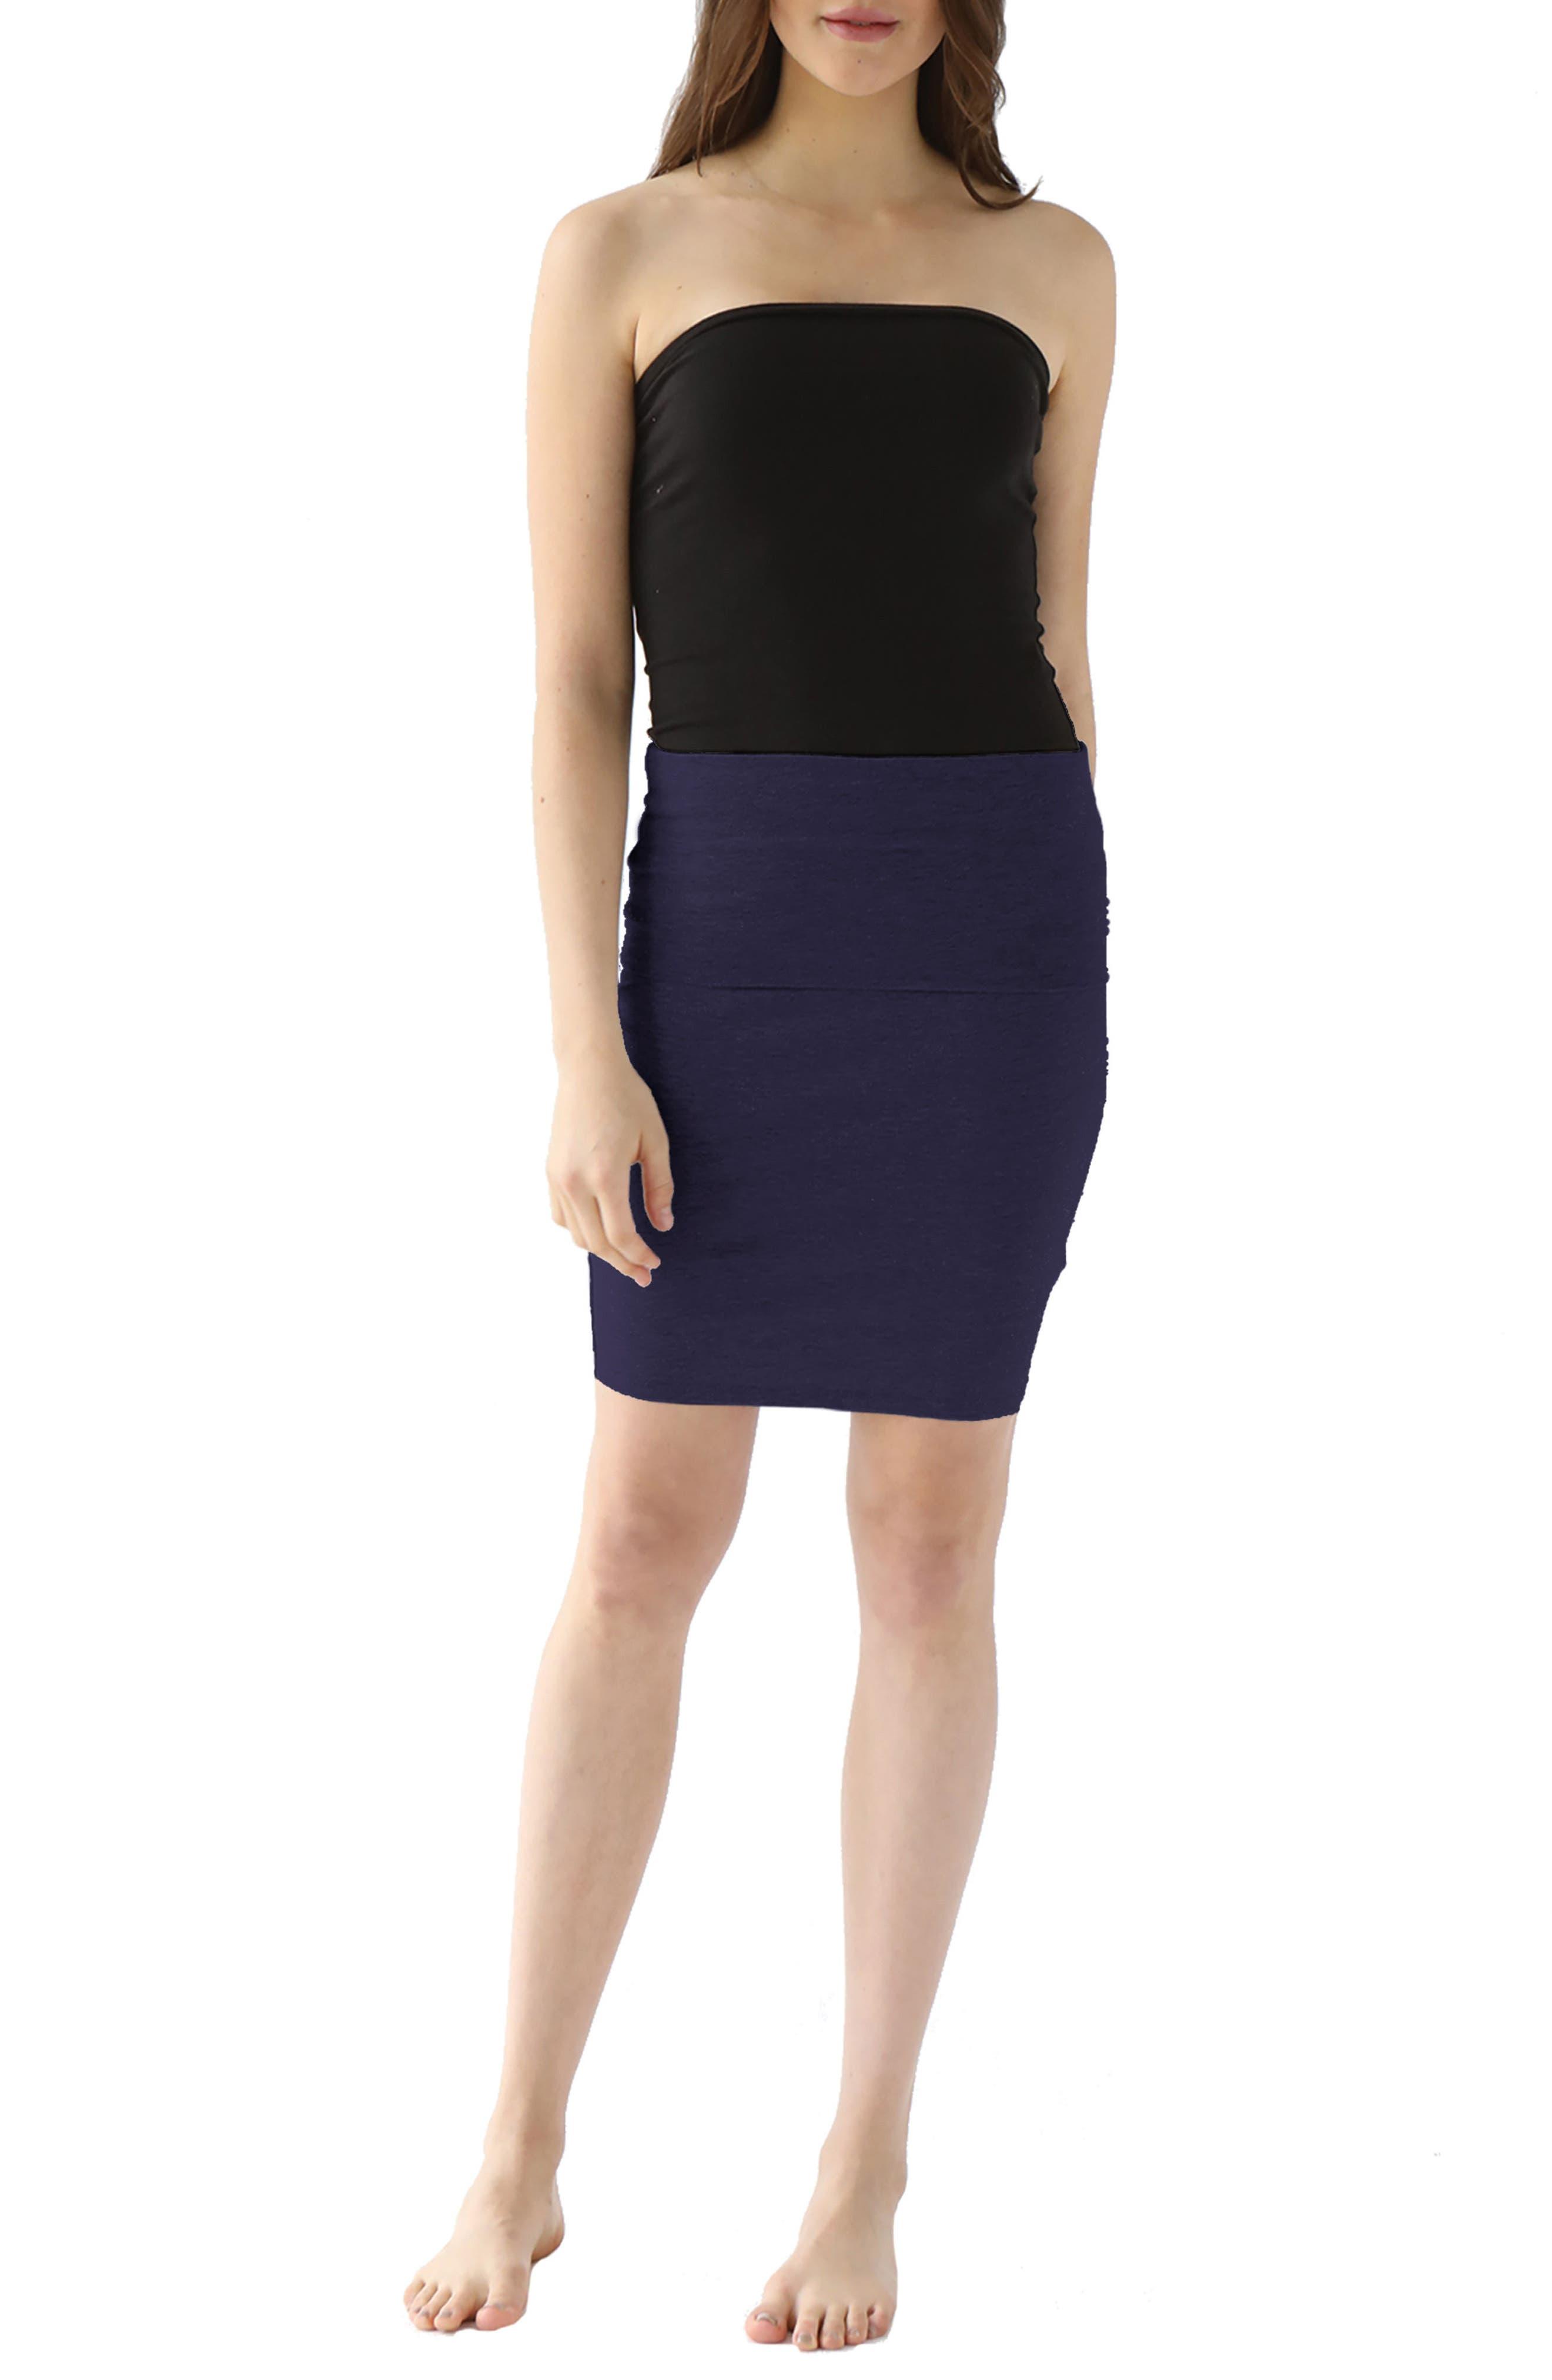 Main Image - LAmade Trina Foldover Stretch Cotton Skirt